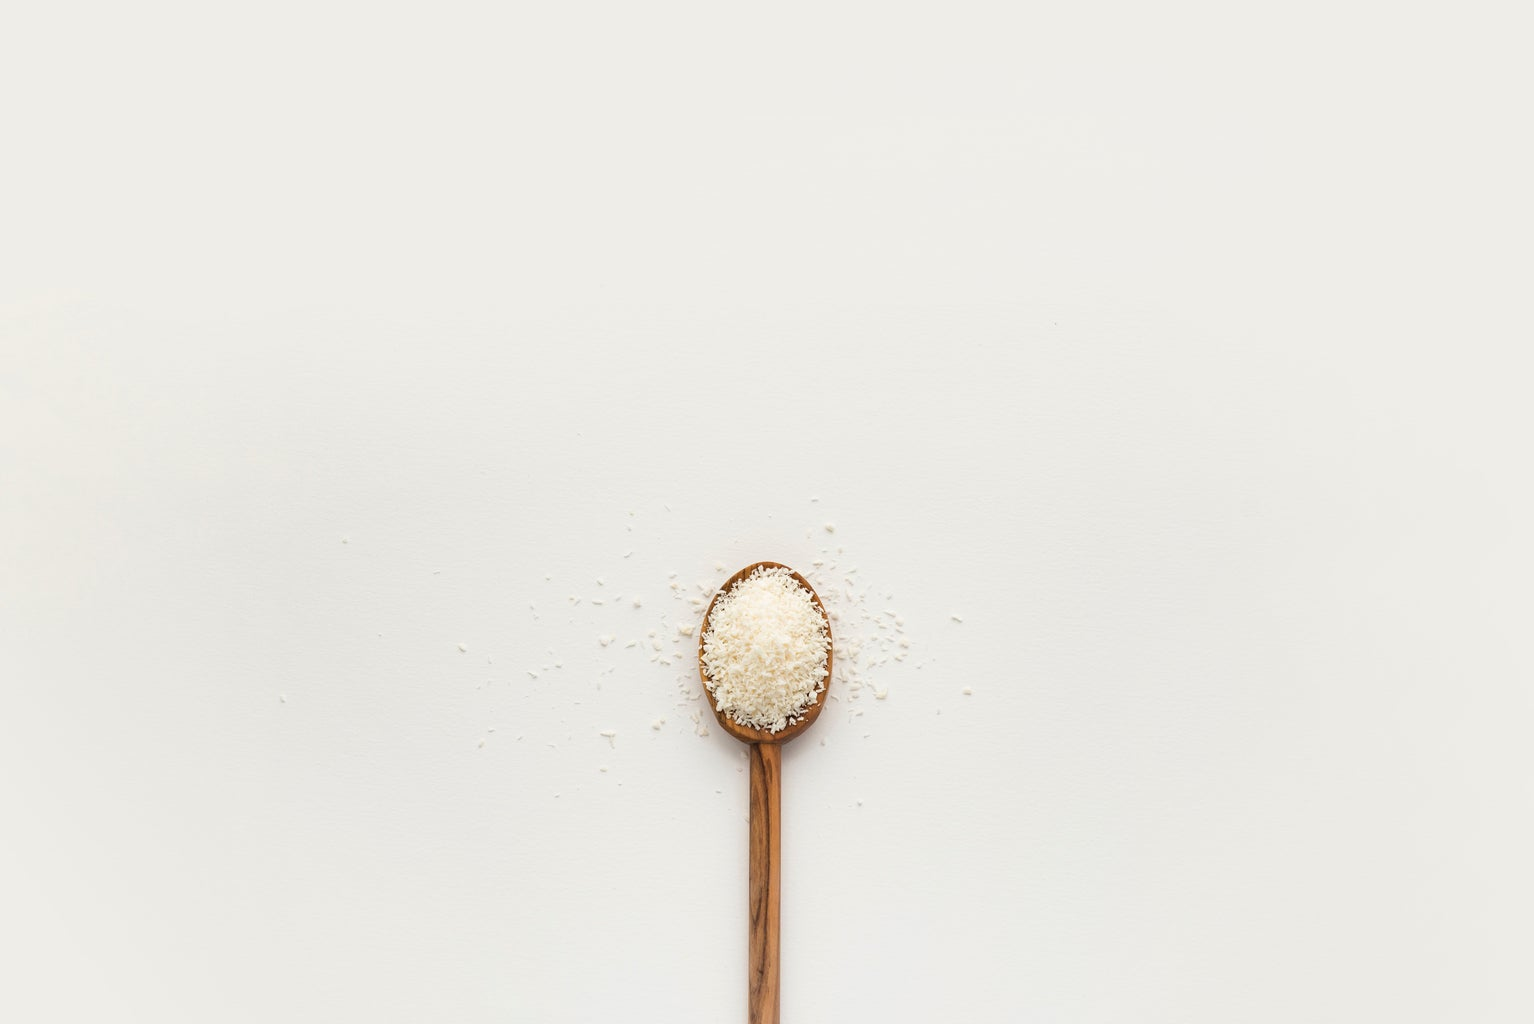 spoon of shredded coconut